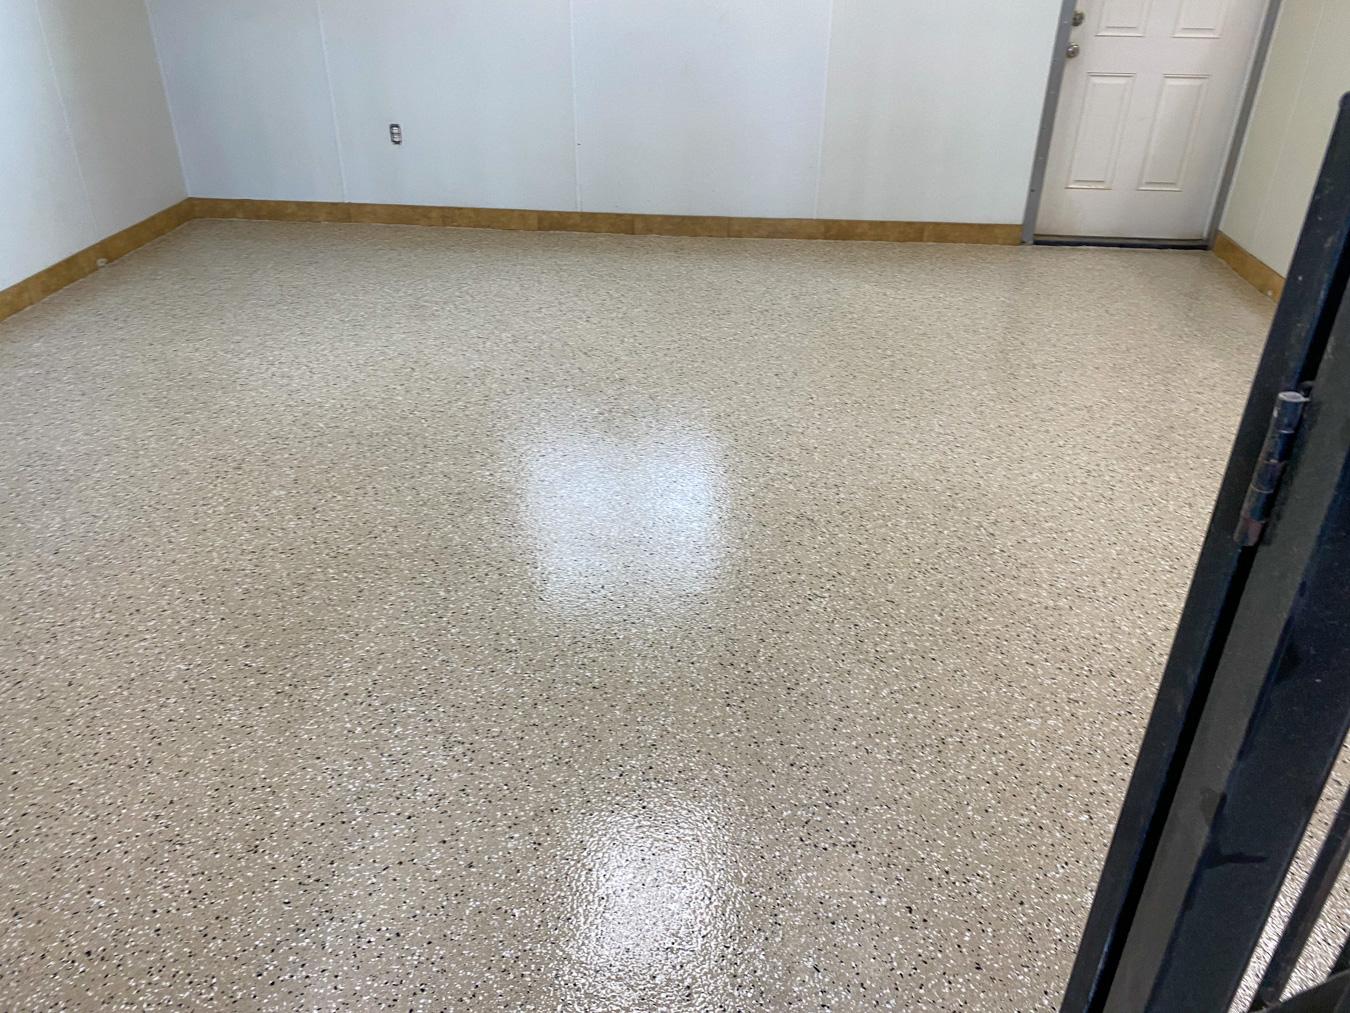 Tan concrete epoxy coating in a storage room